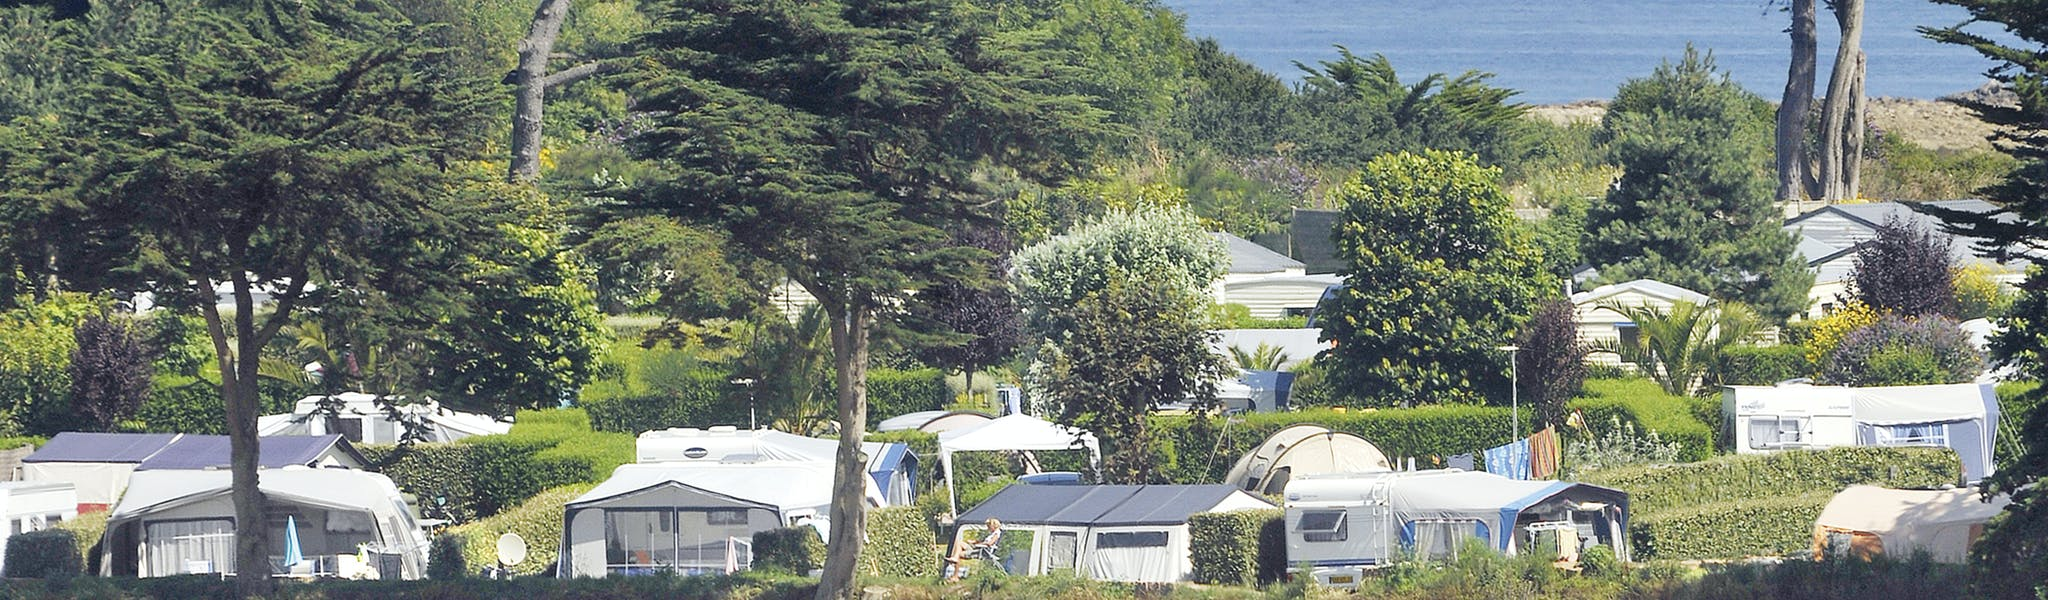 Camping Port l Epine